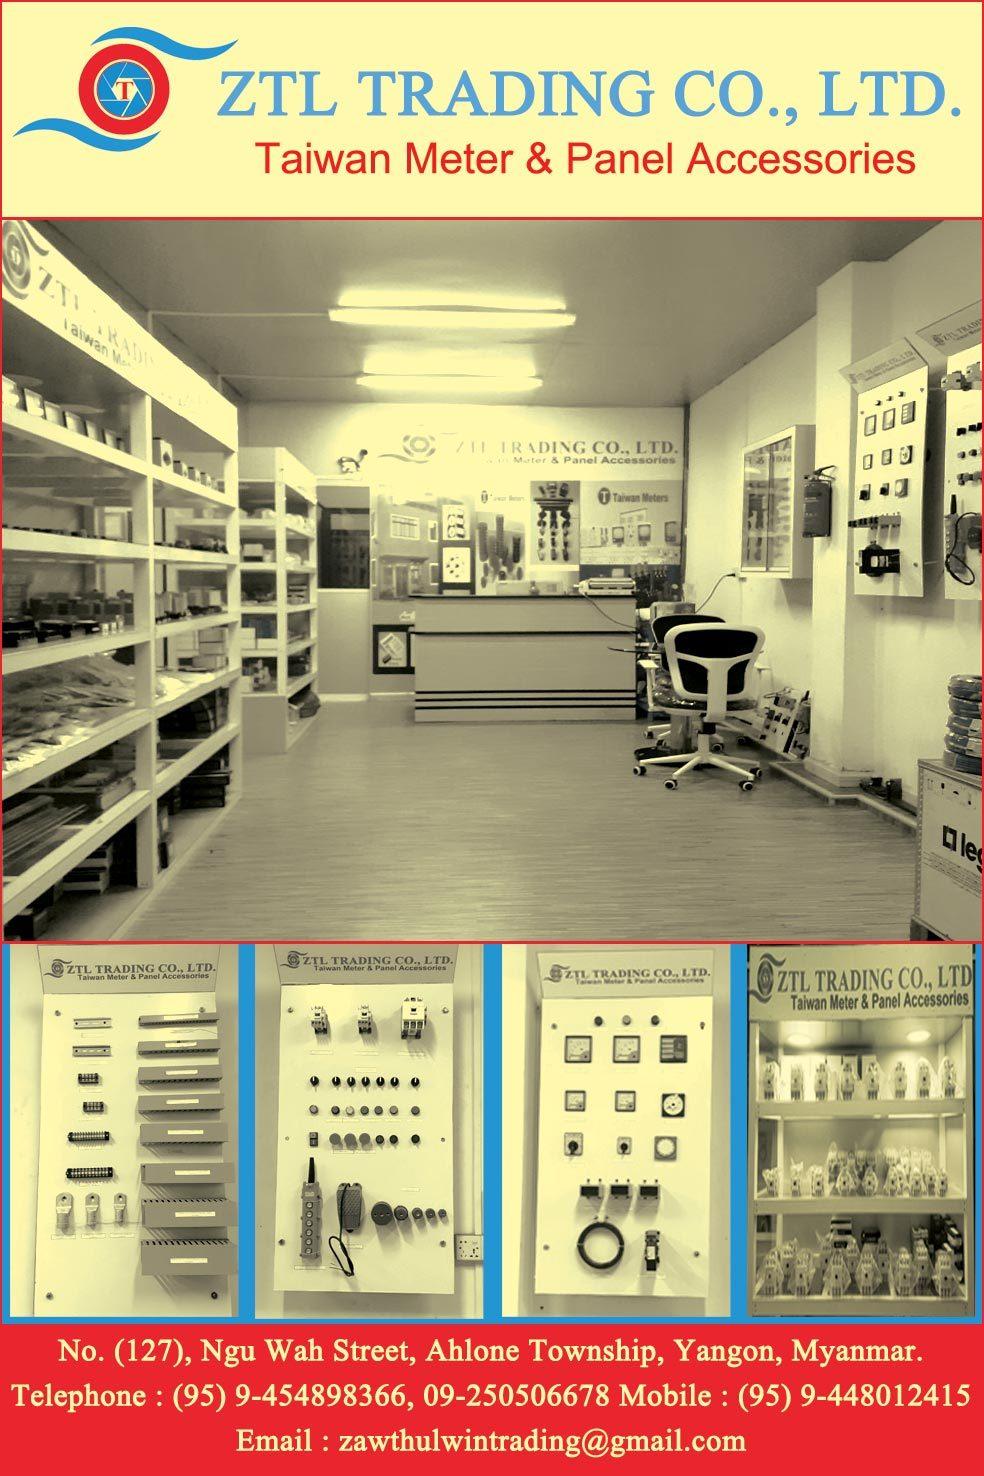 ZTL-Trading-CoLtd_Electrical-Goods-Sales_(D)_3974.jpg